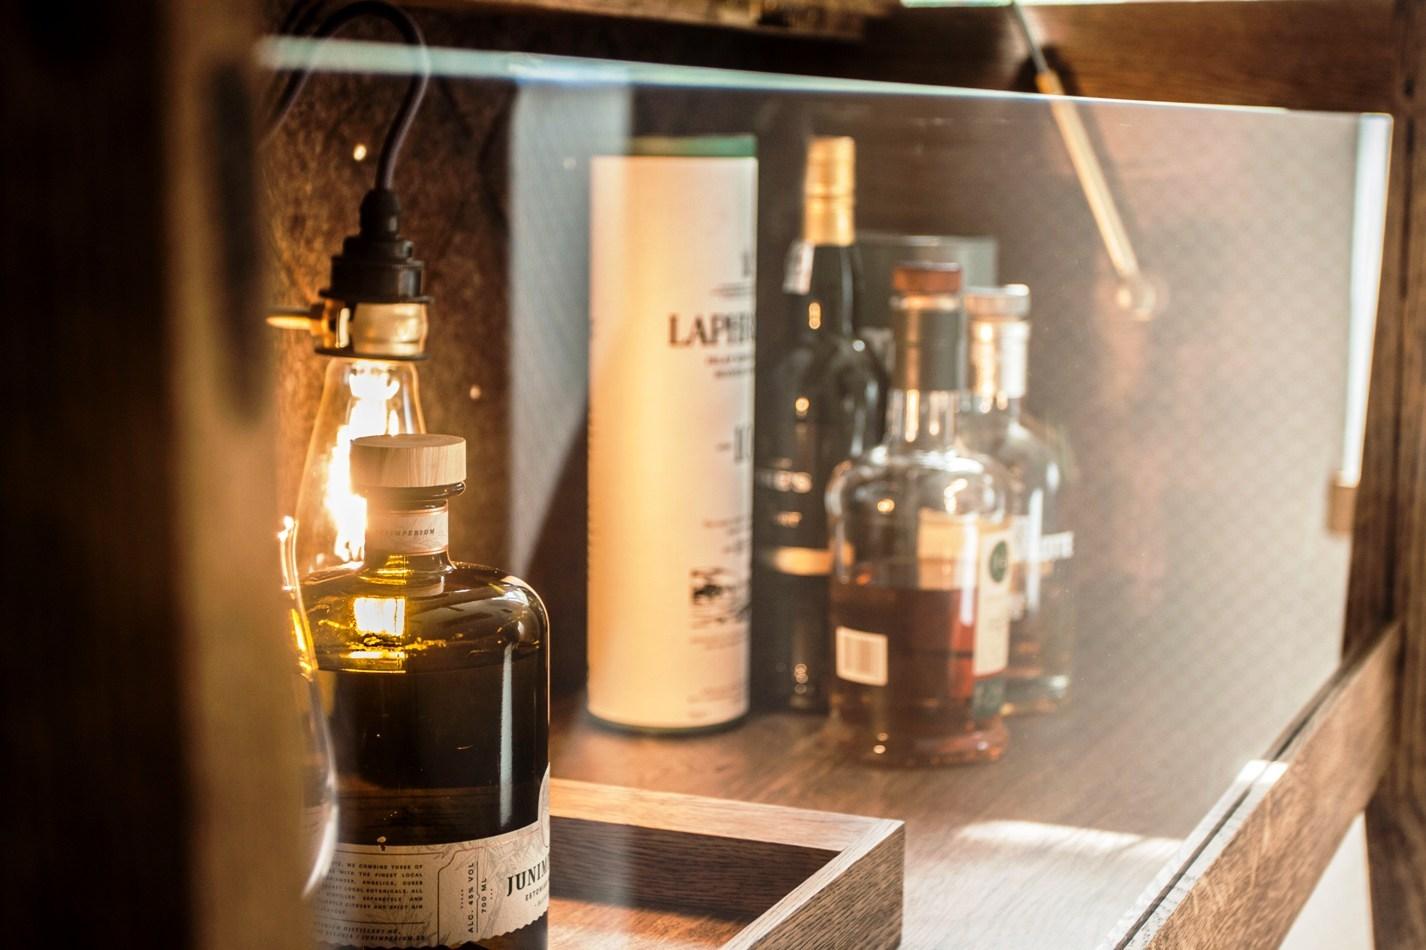 bar-cabinet-minibar-home-bar-sideboard-buffet-baarikapp-whiskey-bar-cabinet-mid-century-19_9619_1